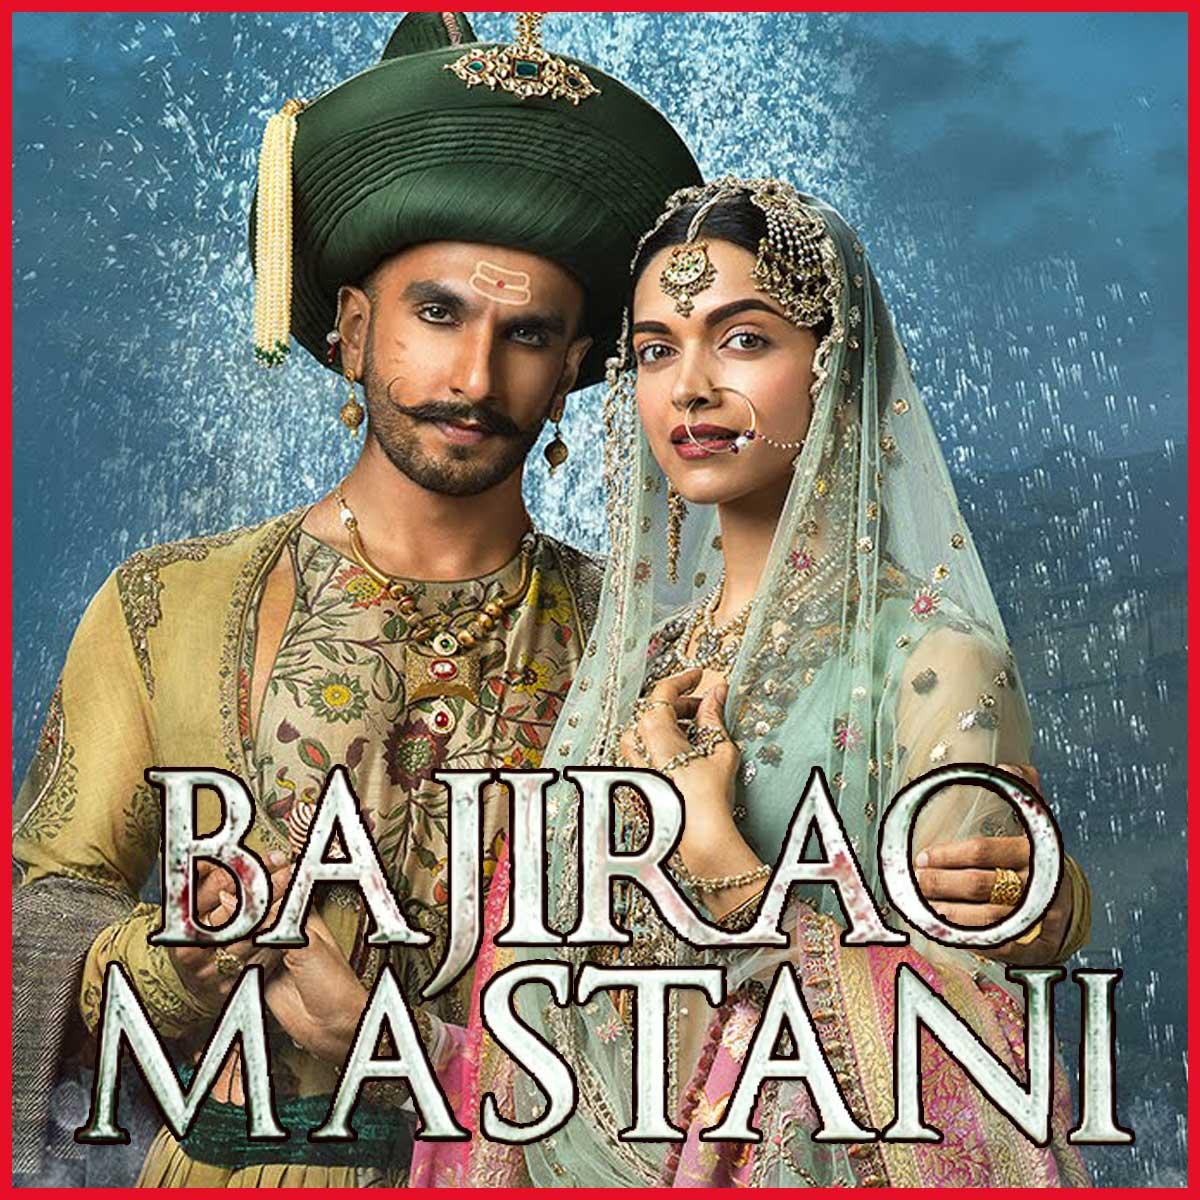 bajirao mastani full movie mp3 free download